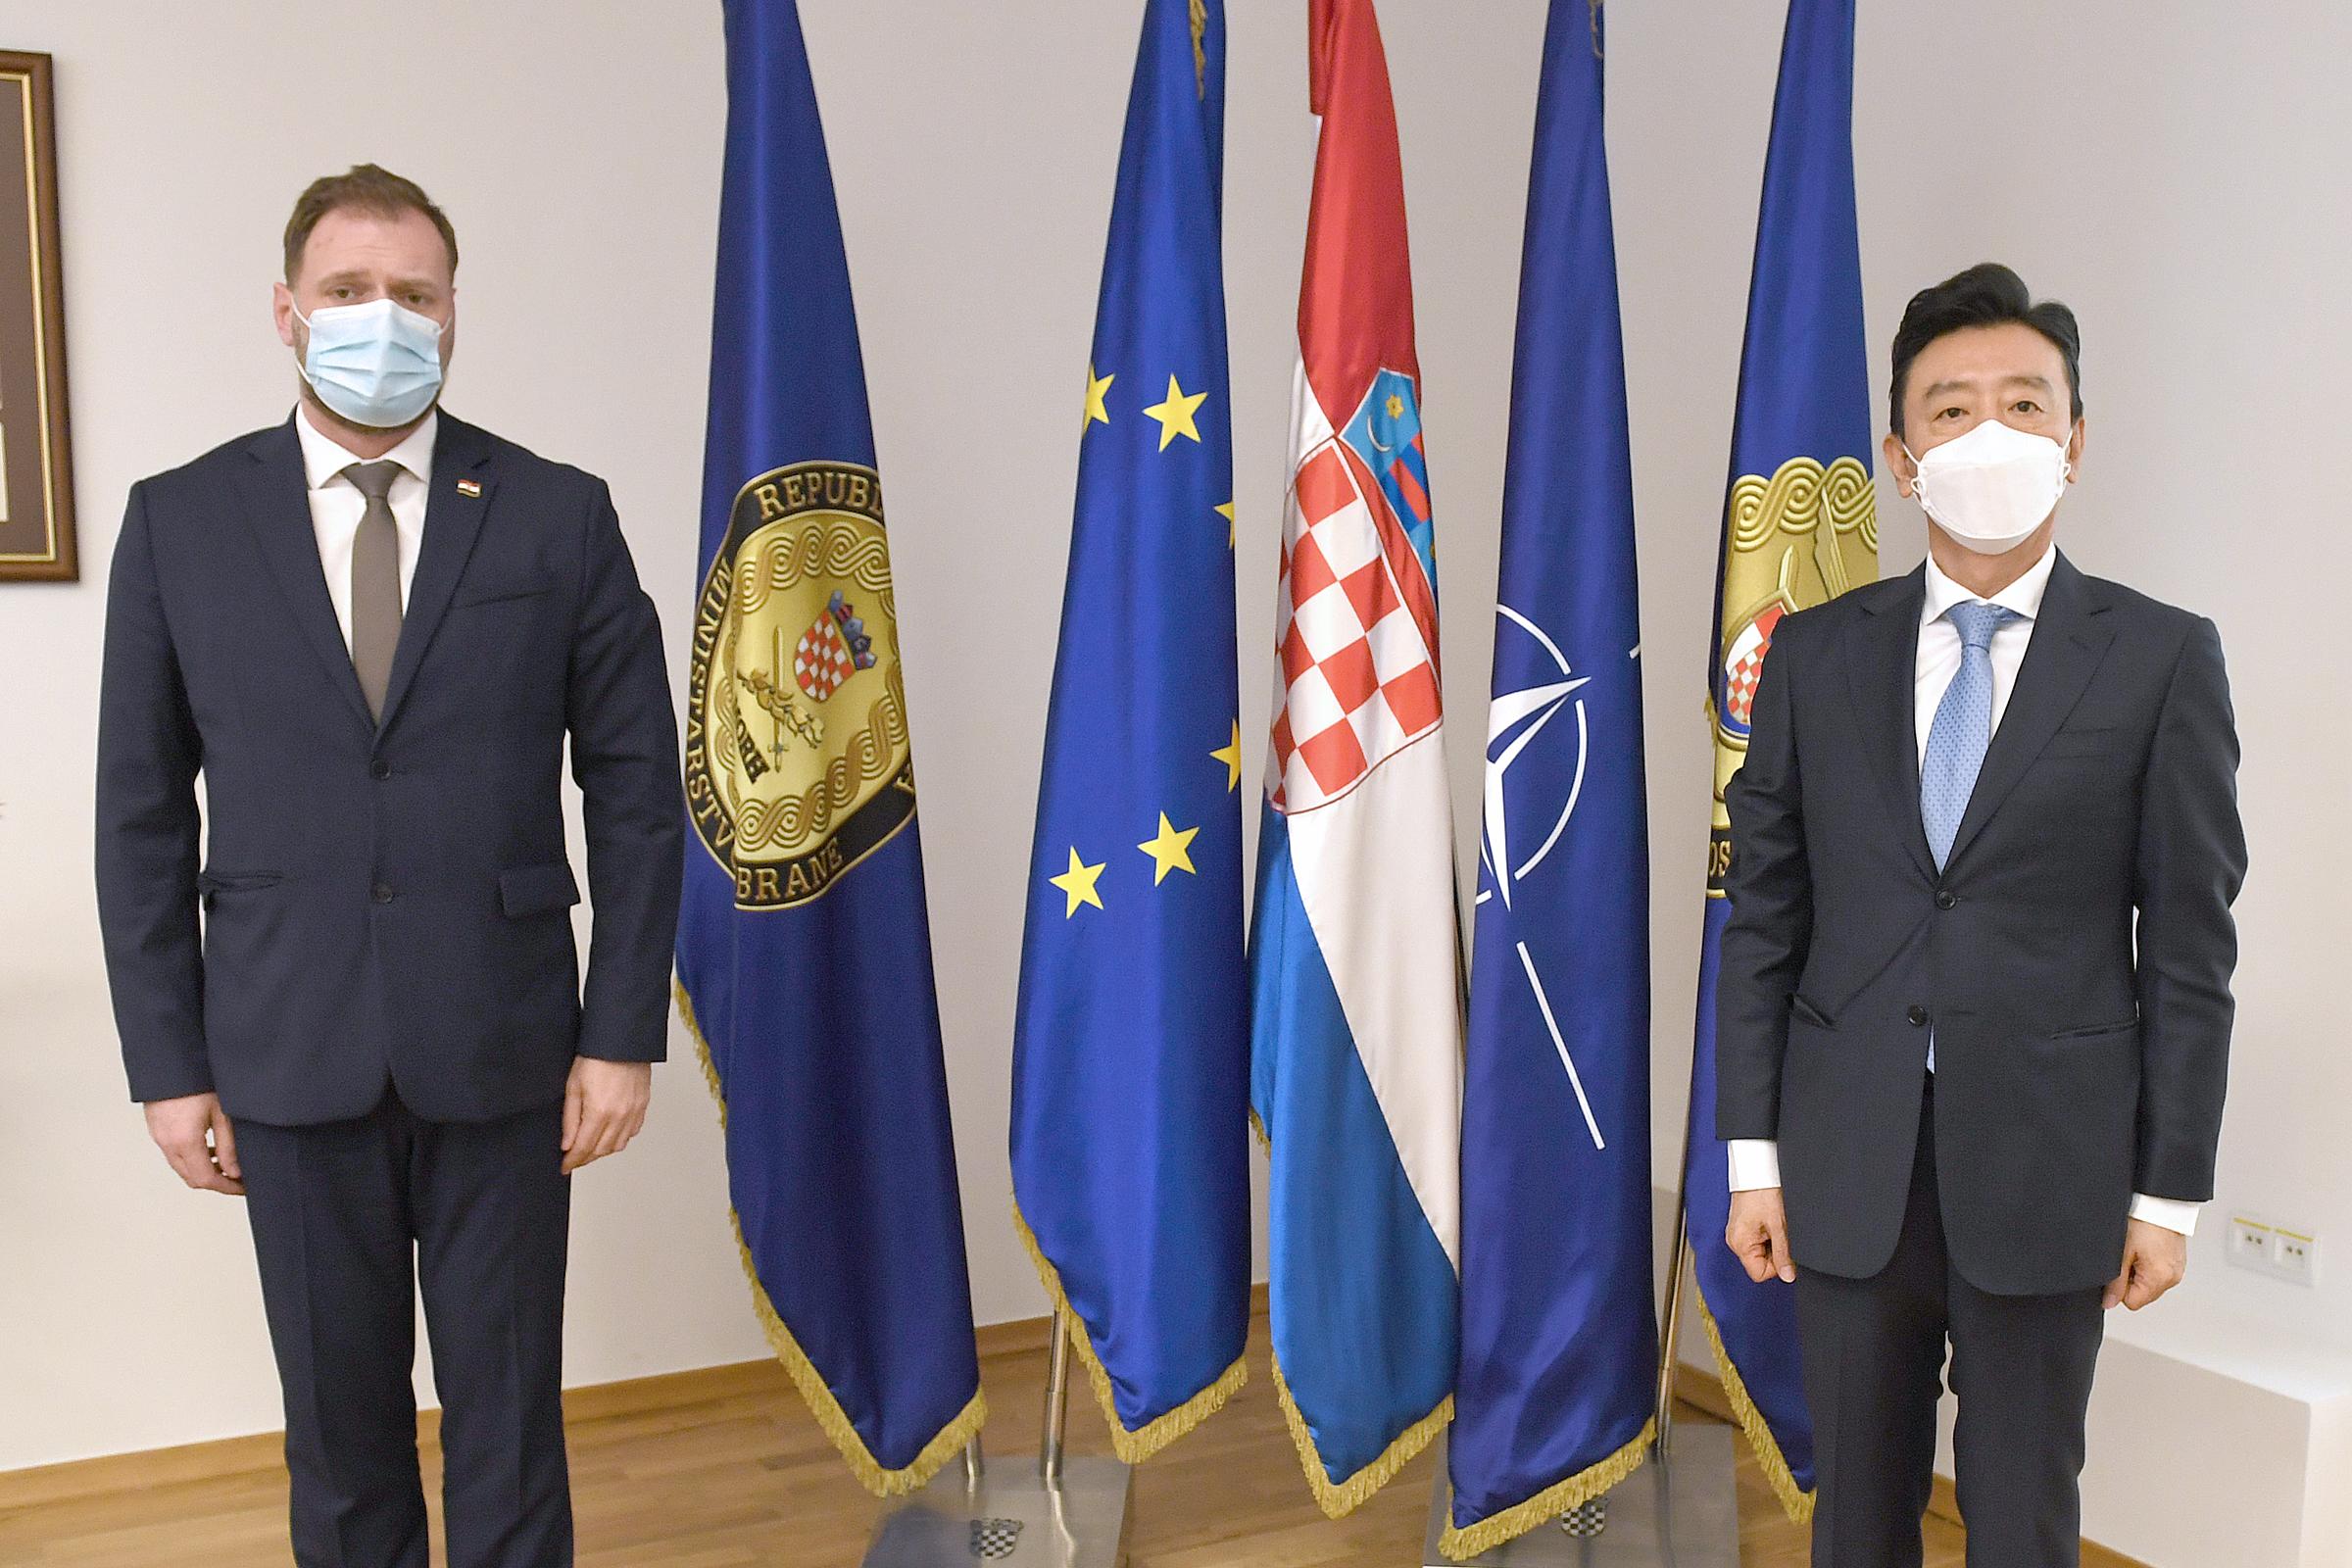 Ministar obrane Banožić s veleposlanikom Republike Koreje Kimom Dong-chanom